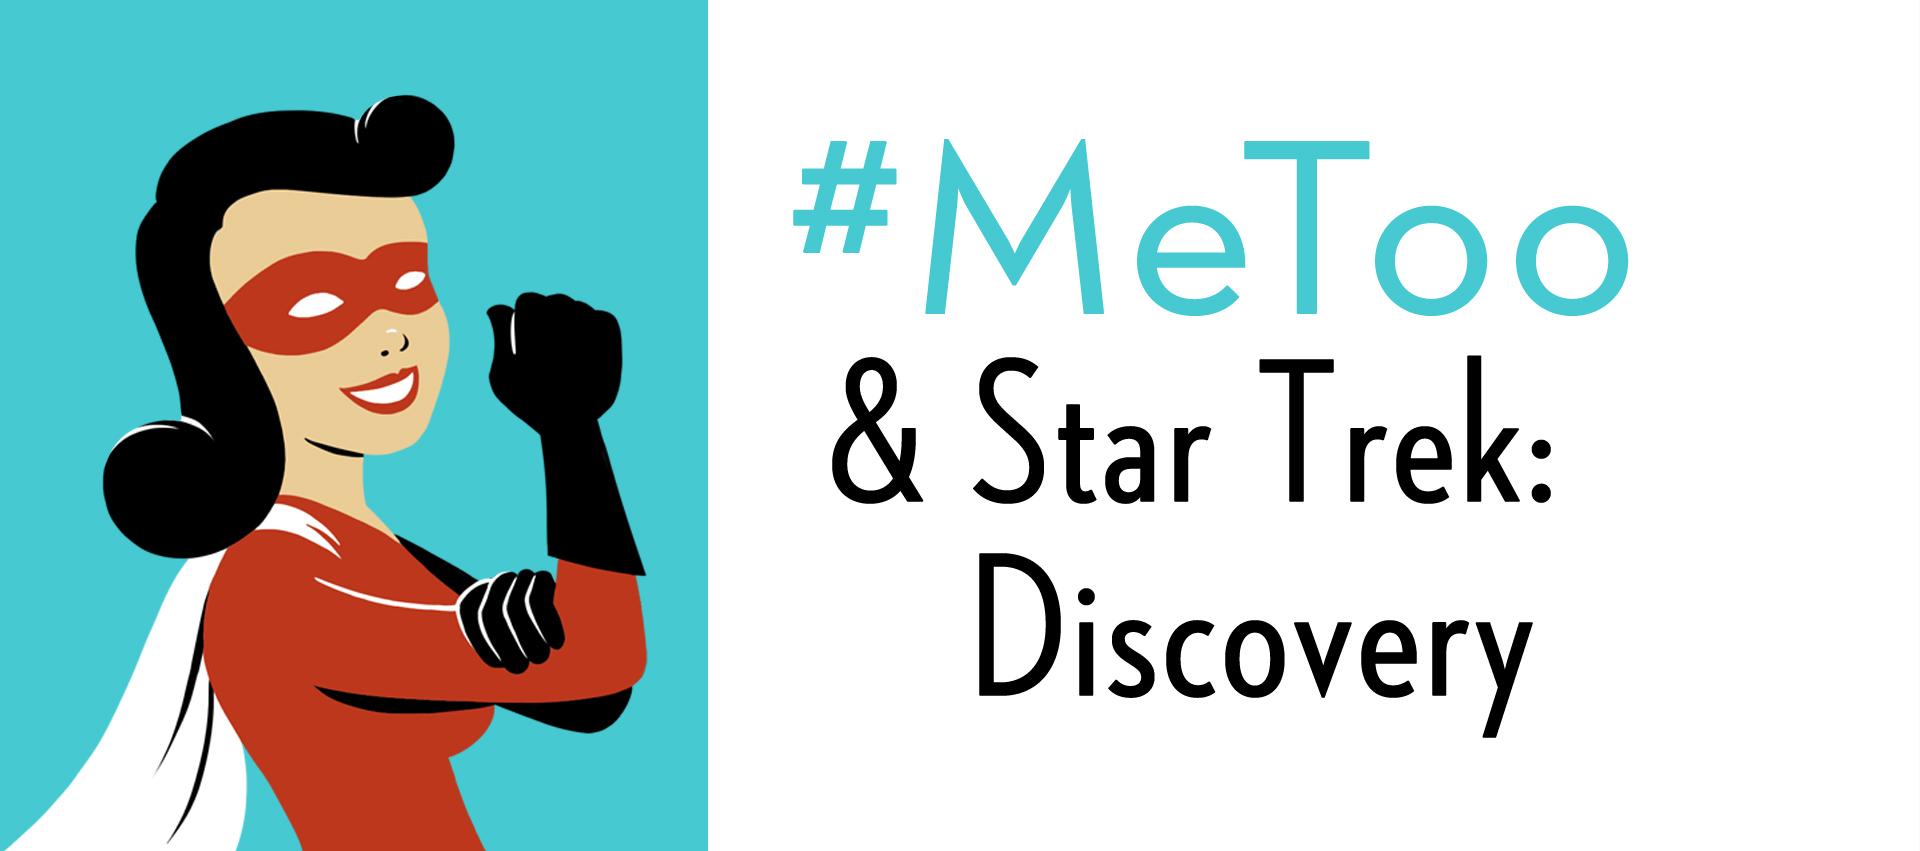 #MeToo & Star Trek: Discovery